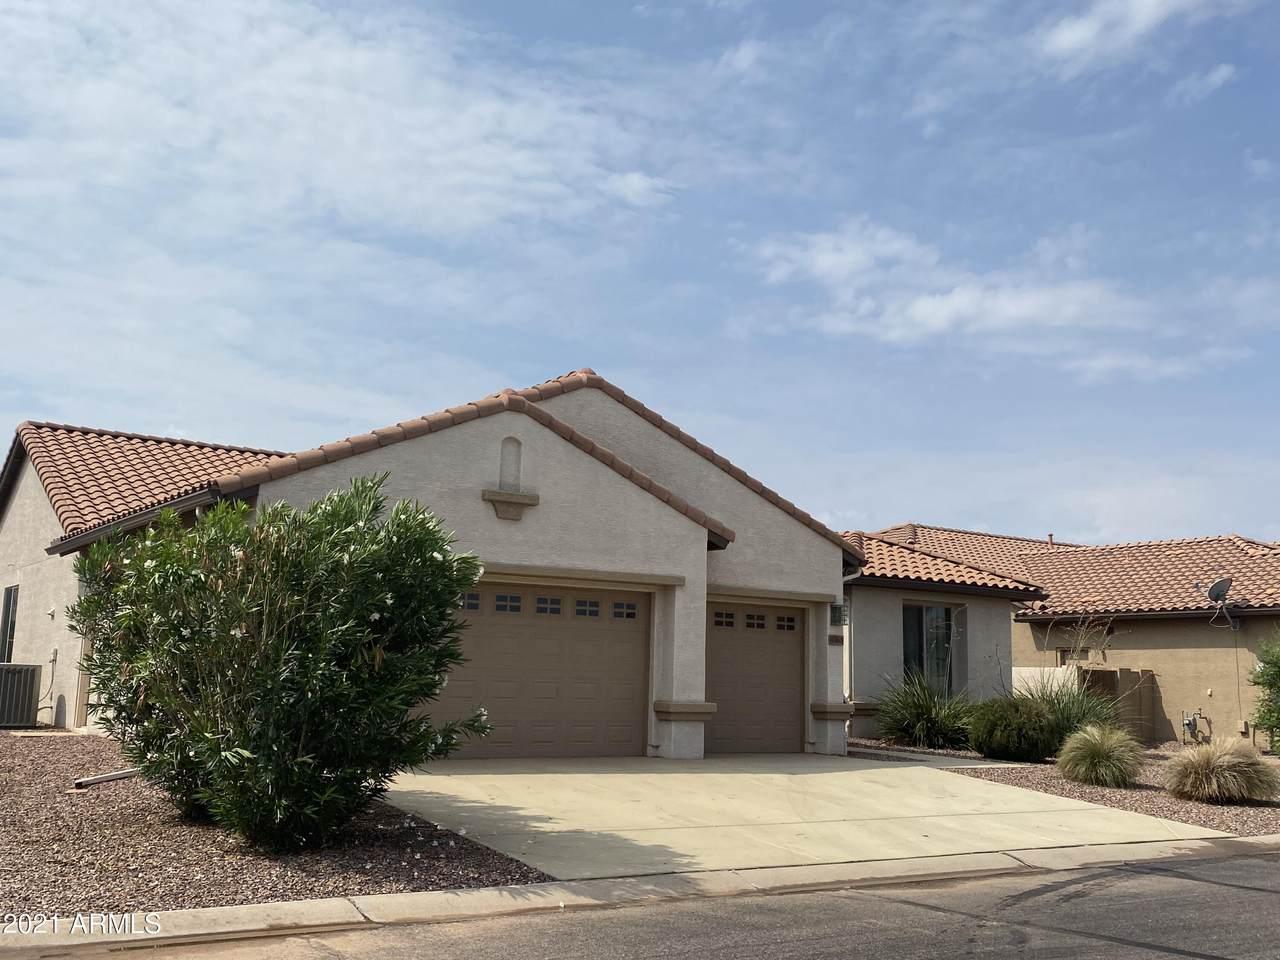 4565 Pueblo Drive - Photo 1